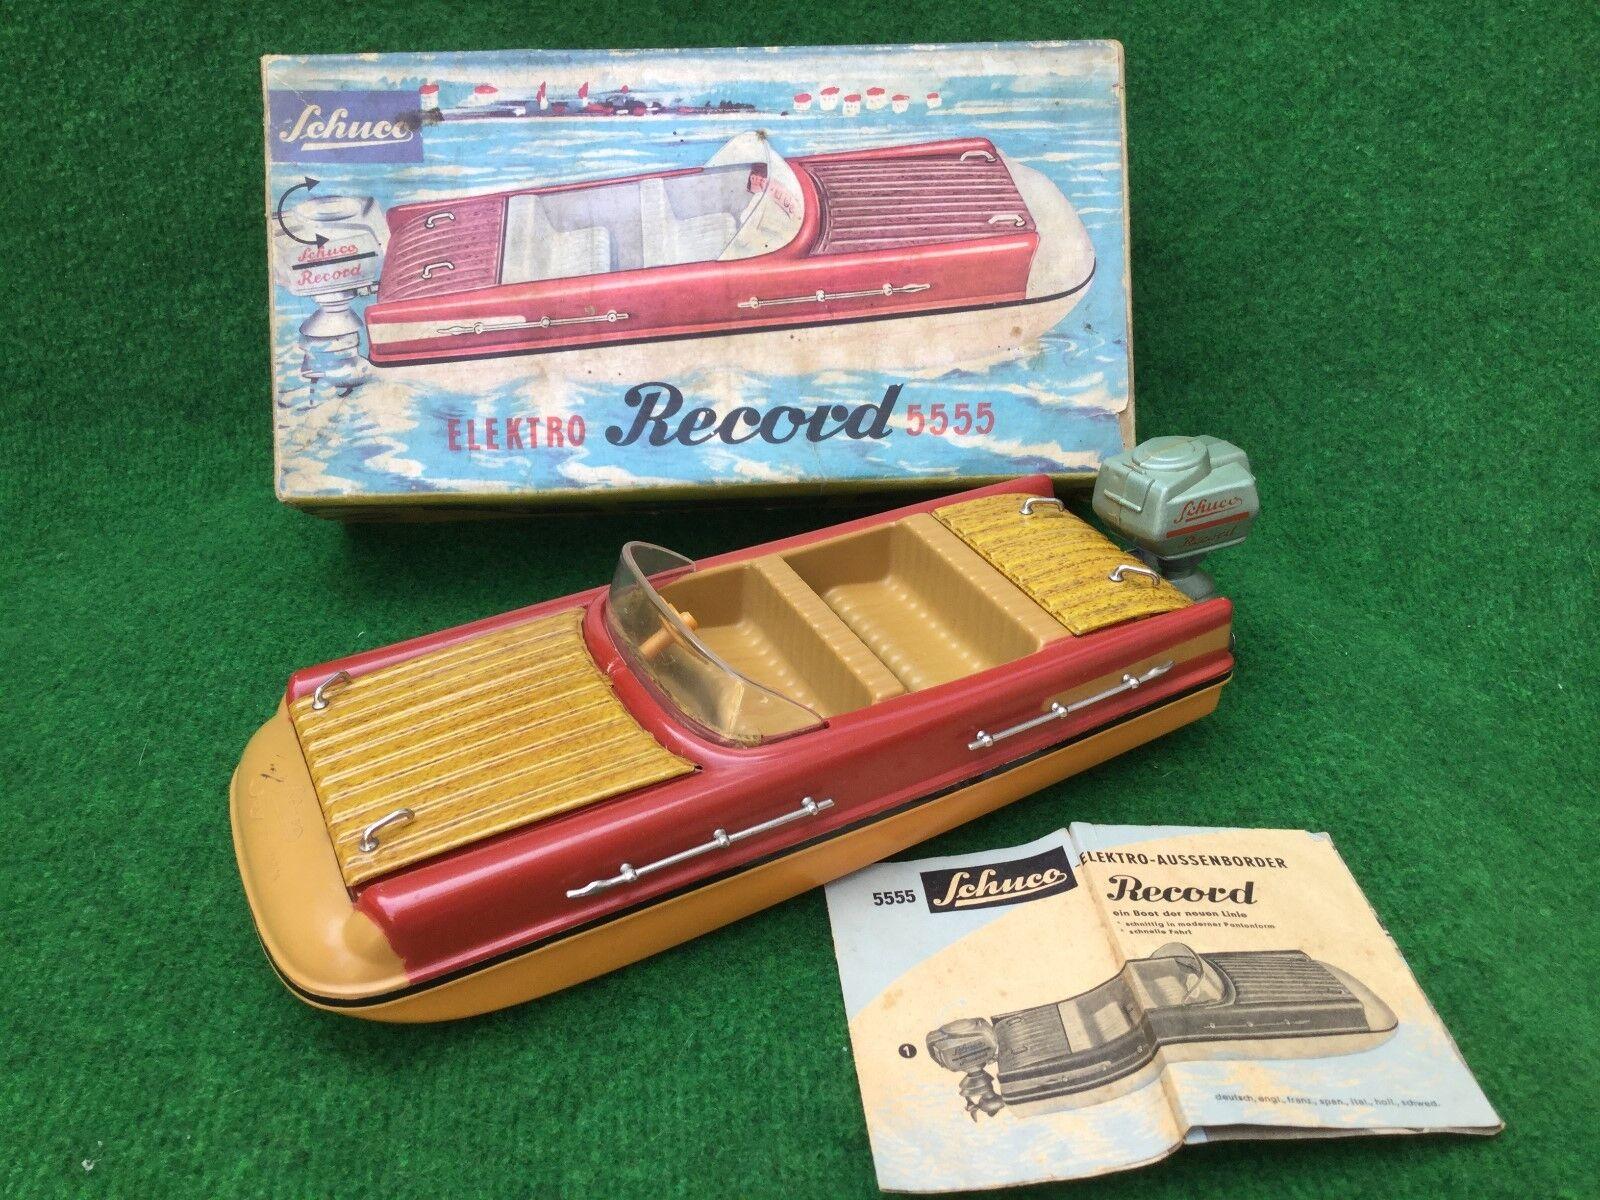 Schuco Elektro record 5555 bota boat W. Germany Boxed